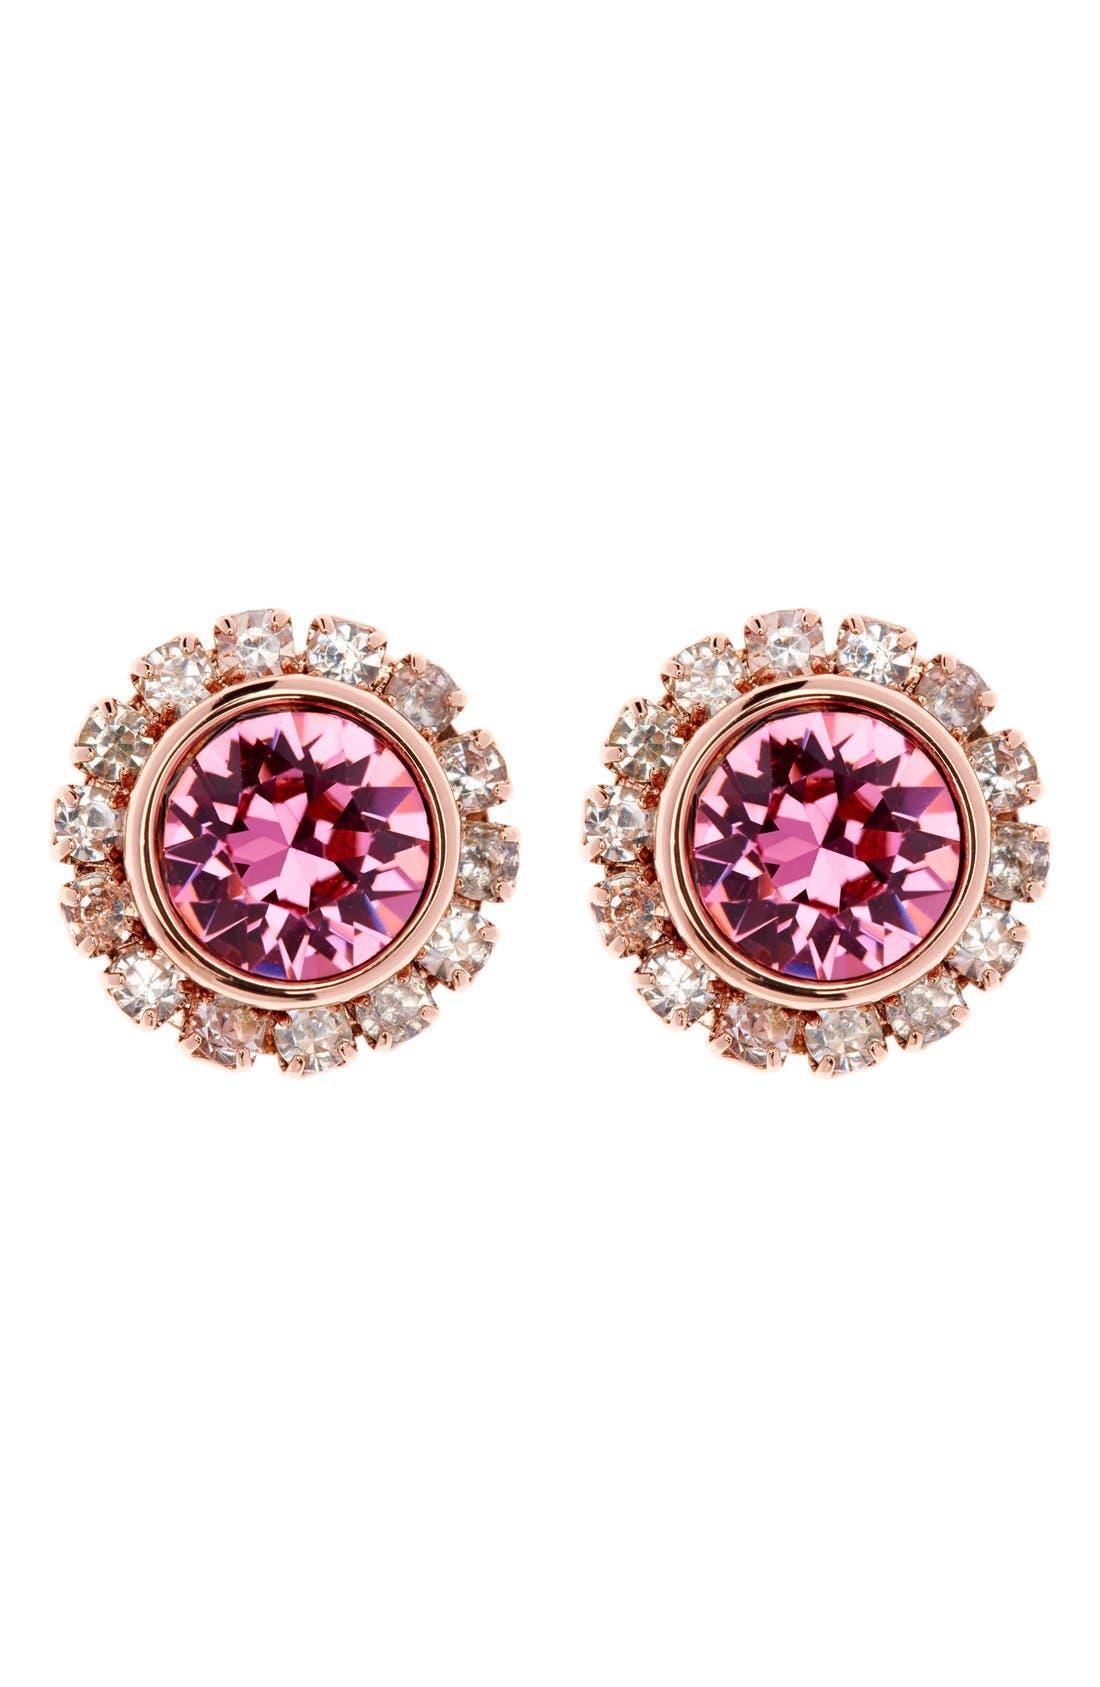 Main Image - Ted Baker London 'Crystal Daisy' Stud Earrings